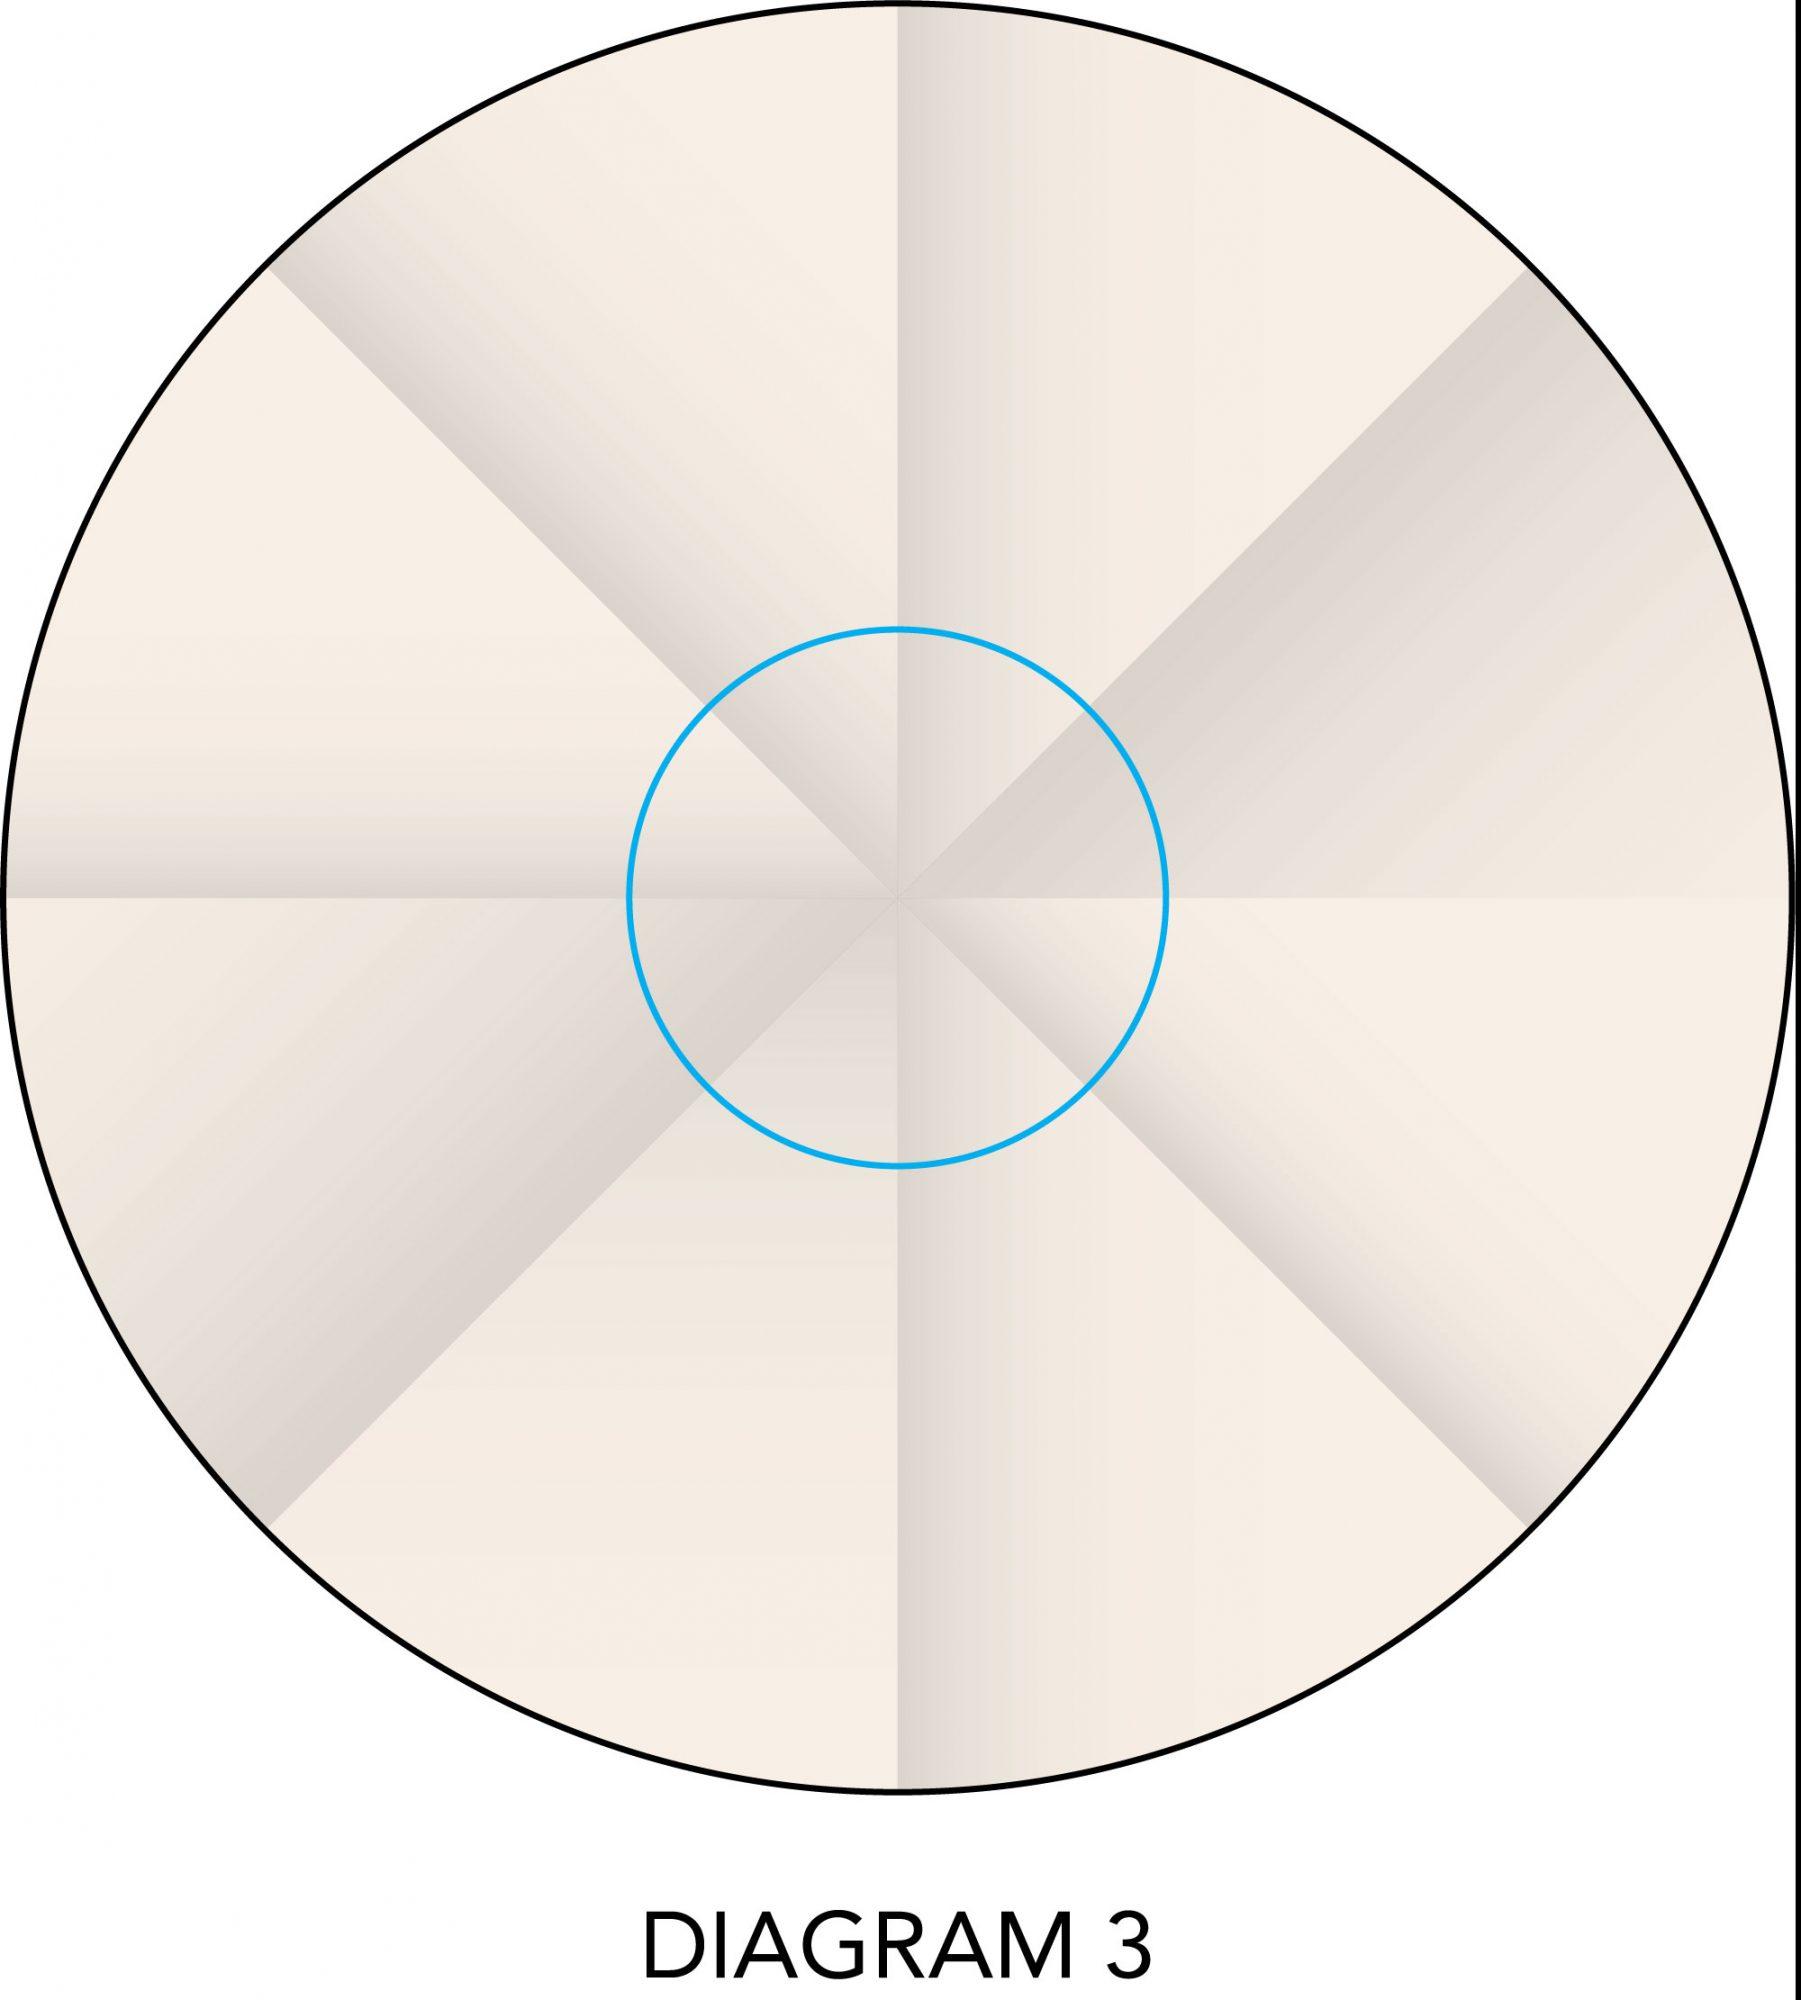 Shiny Baubles diagram 3